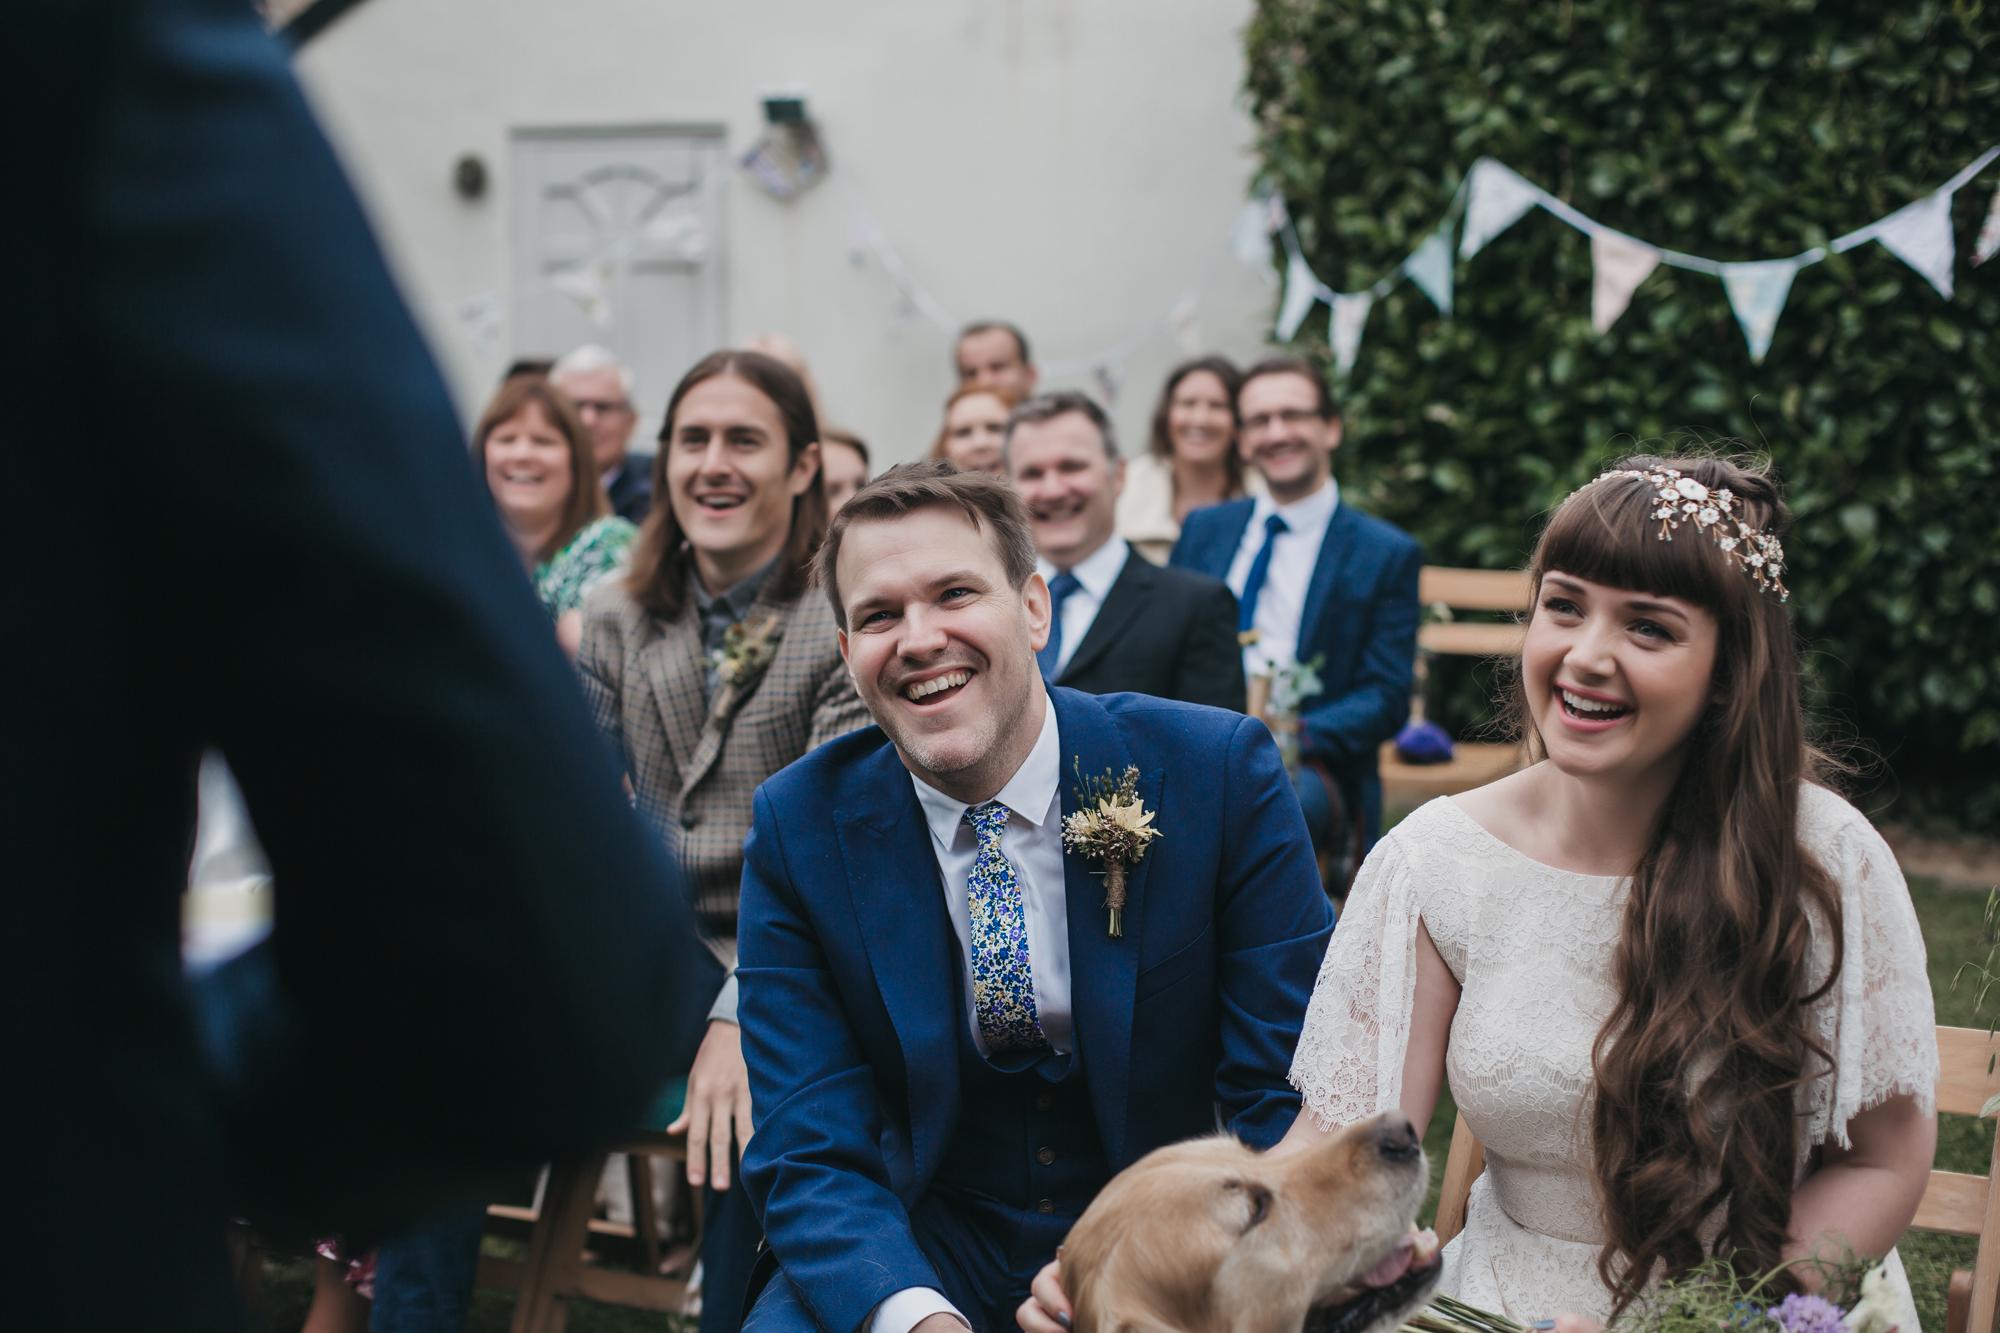 Kristy-Back-Garden-Outdoor-Wedding-Sheffield-Industrial-Warehouse-Wedding-Bohemian-Kate-Beaumont-Dahlia-Dress-13.jpg